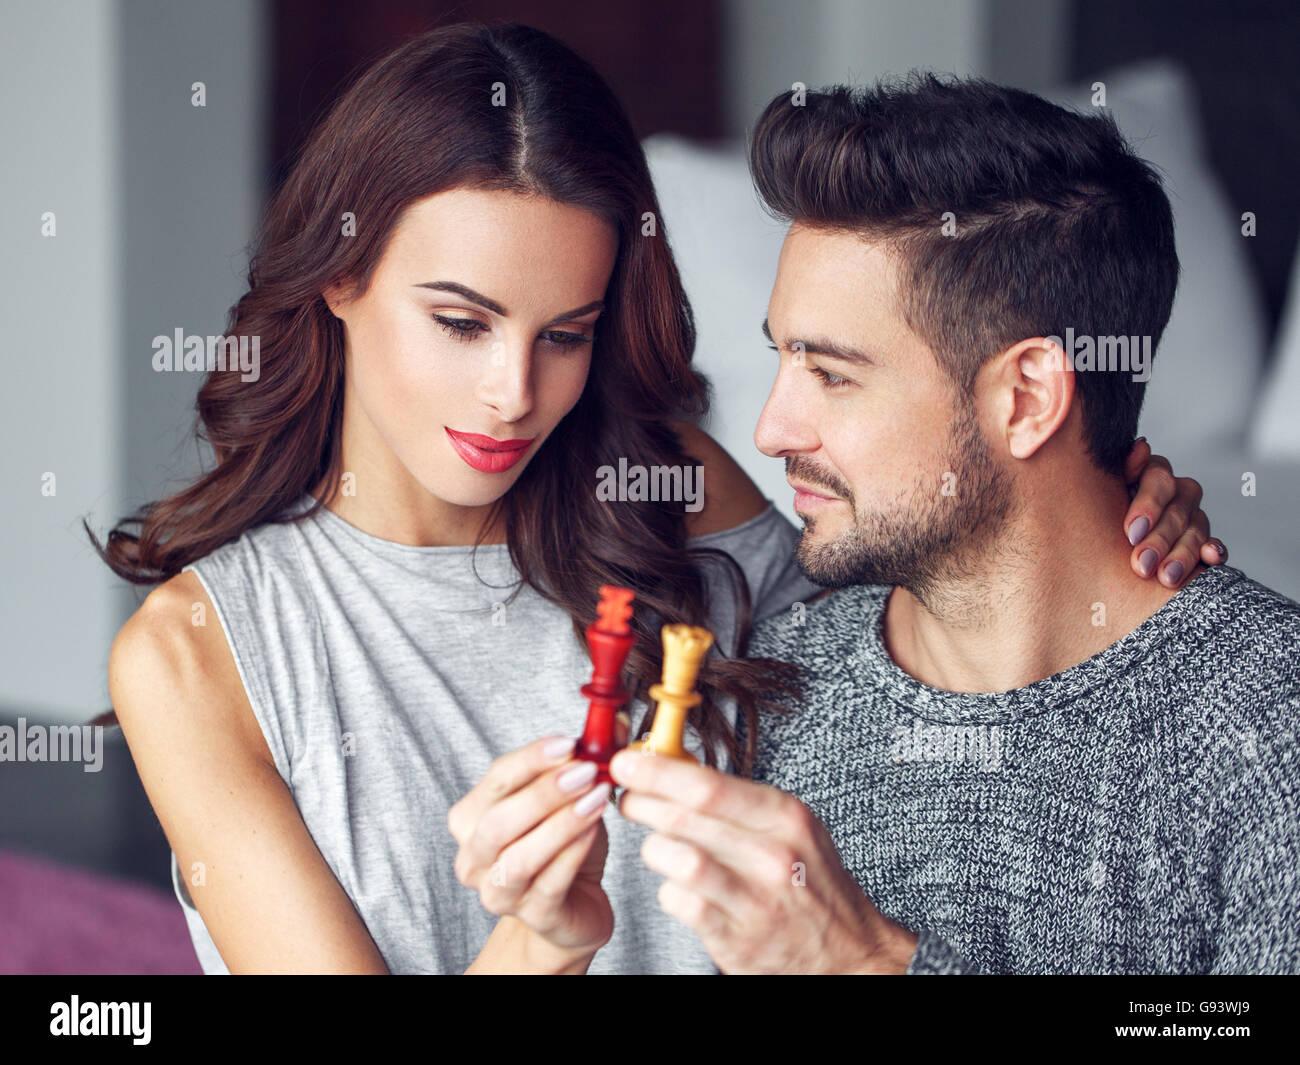 Kostenloses Online-Dating-Phönix